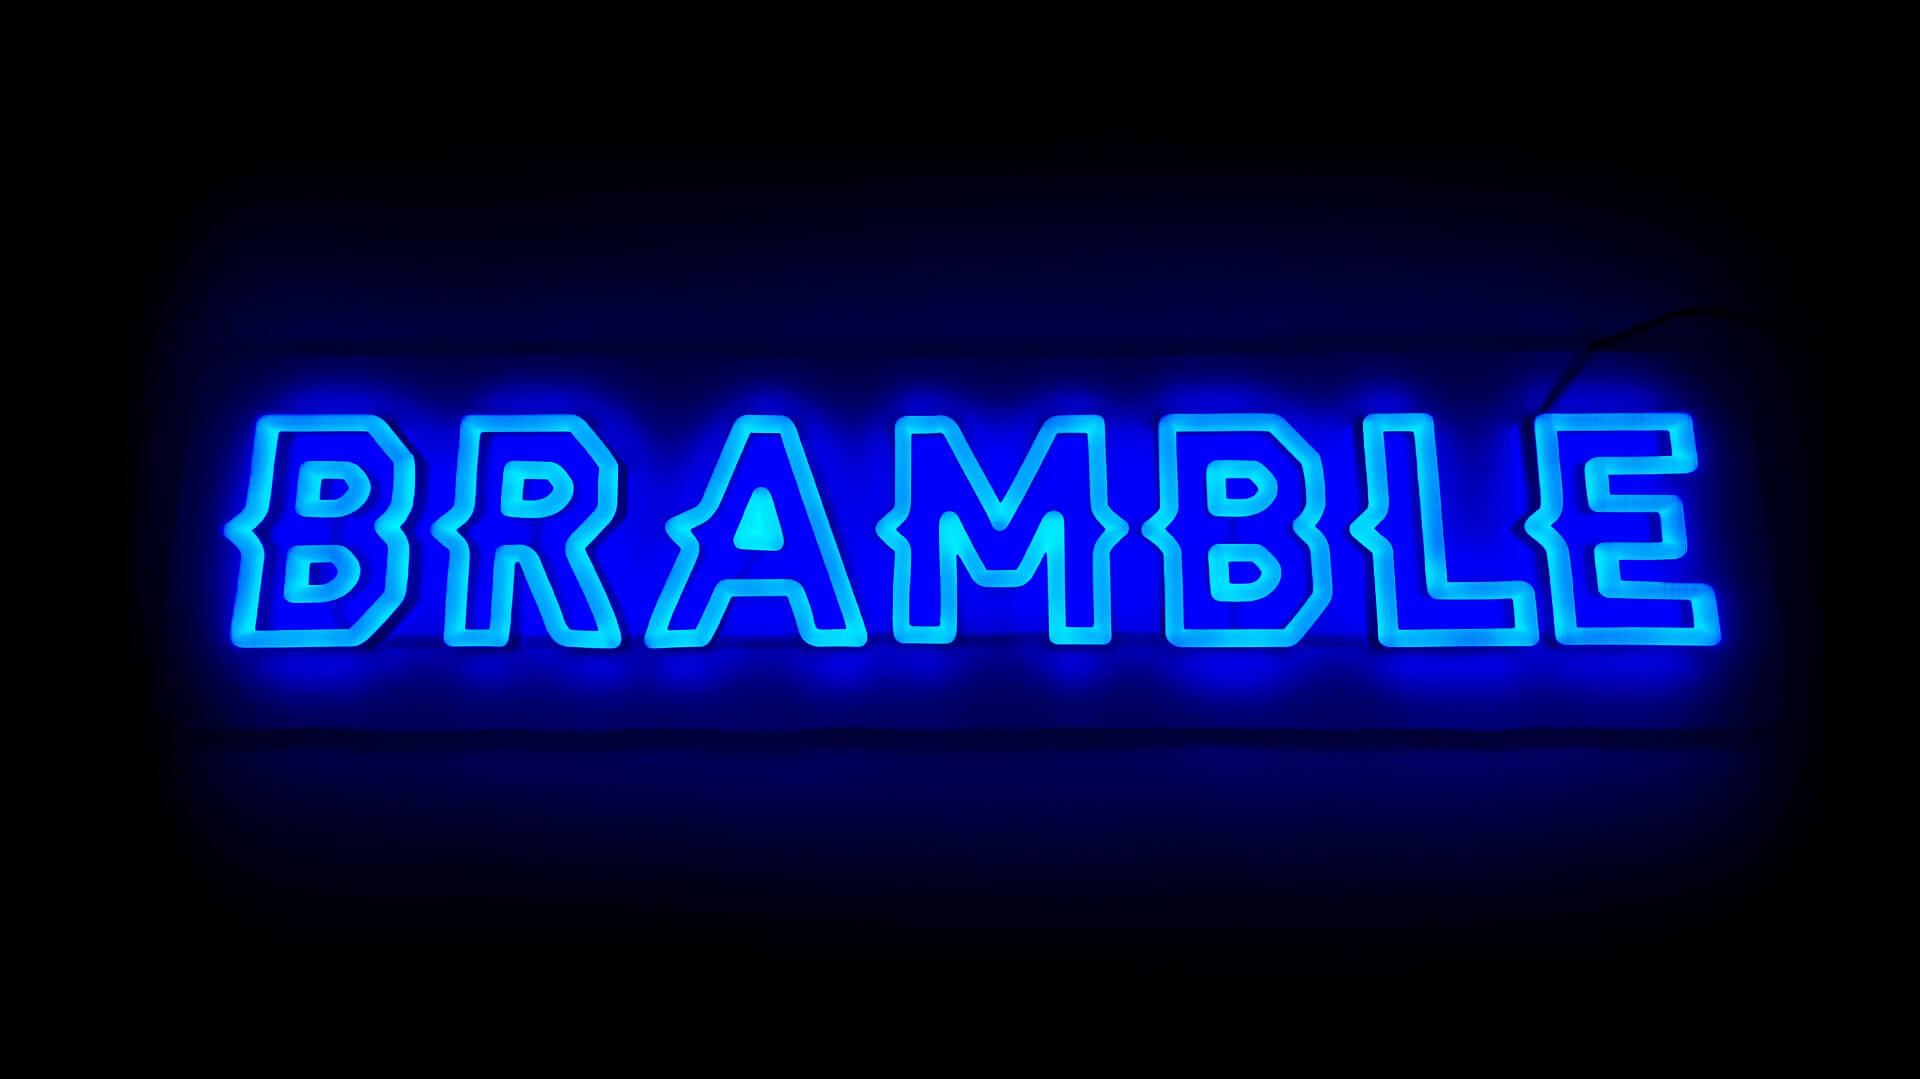 Logo Neon Sign for Bramble